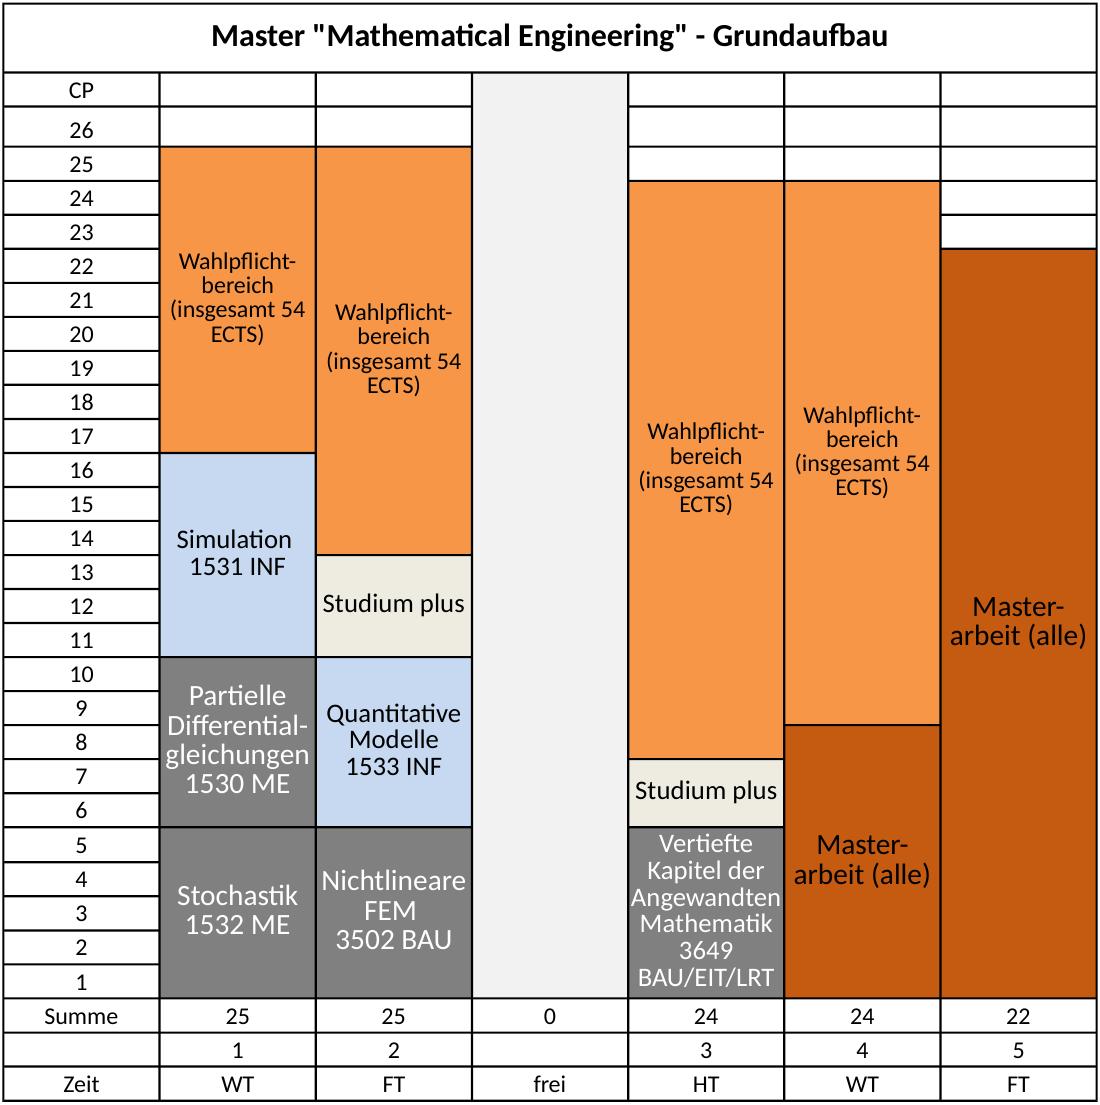 Https://Www.Unibw.De/Me/Studiengaenge/Me_Ma_Grundaufbau_Ab_2021.Png